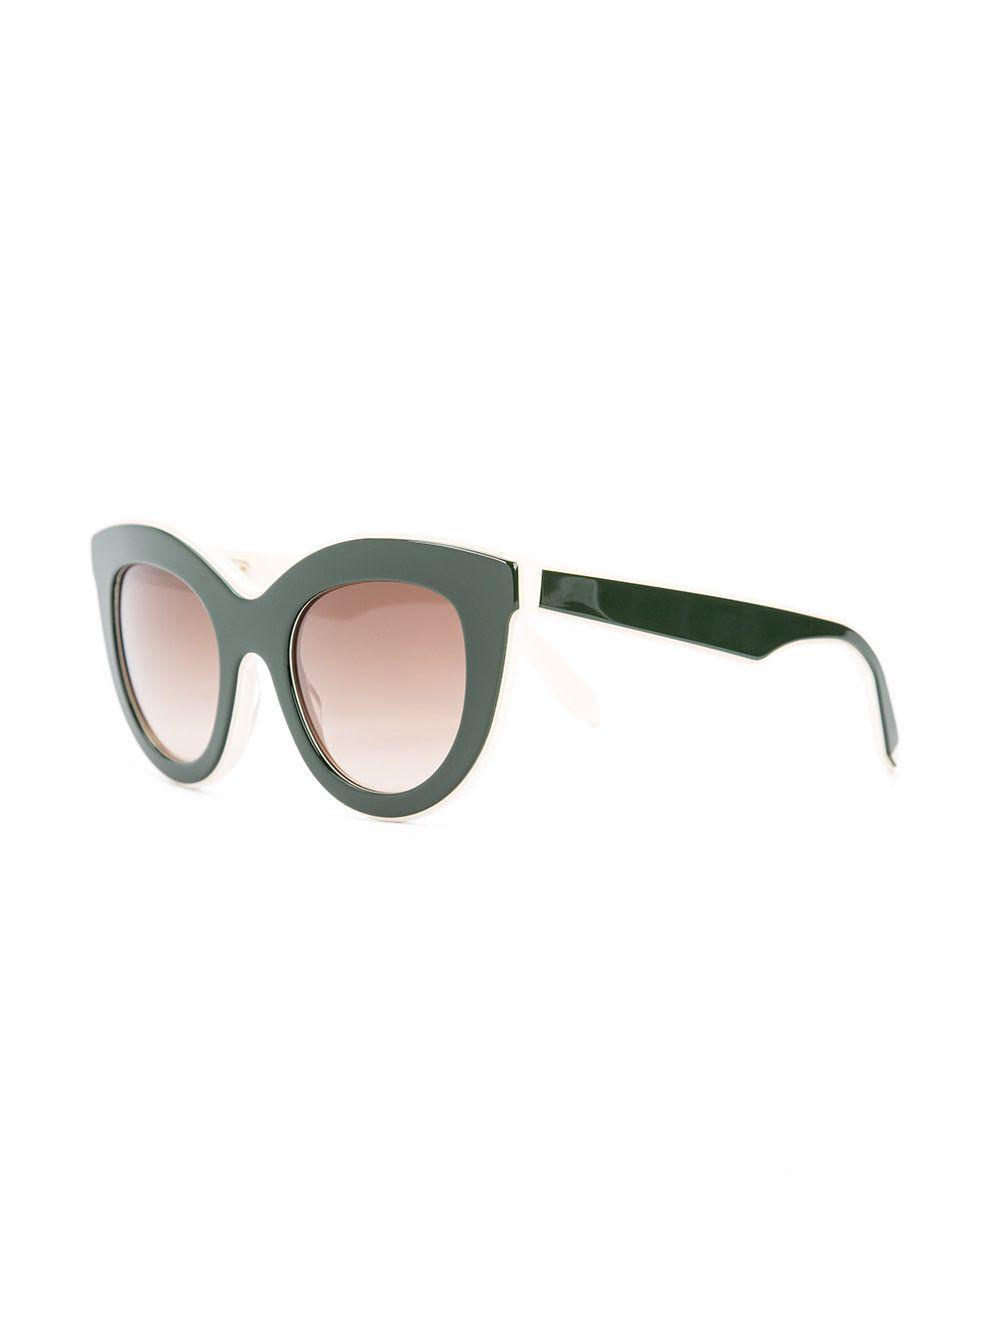 Victoria Beckham cat eye sunglasses